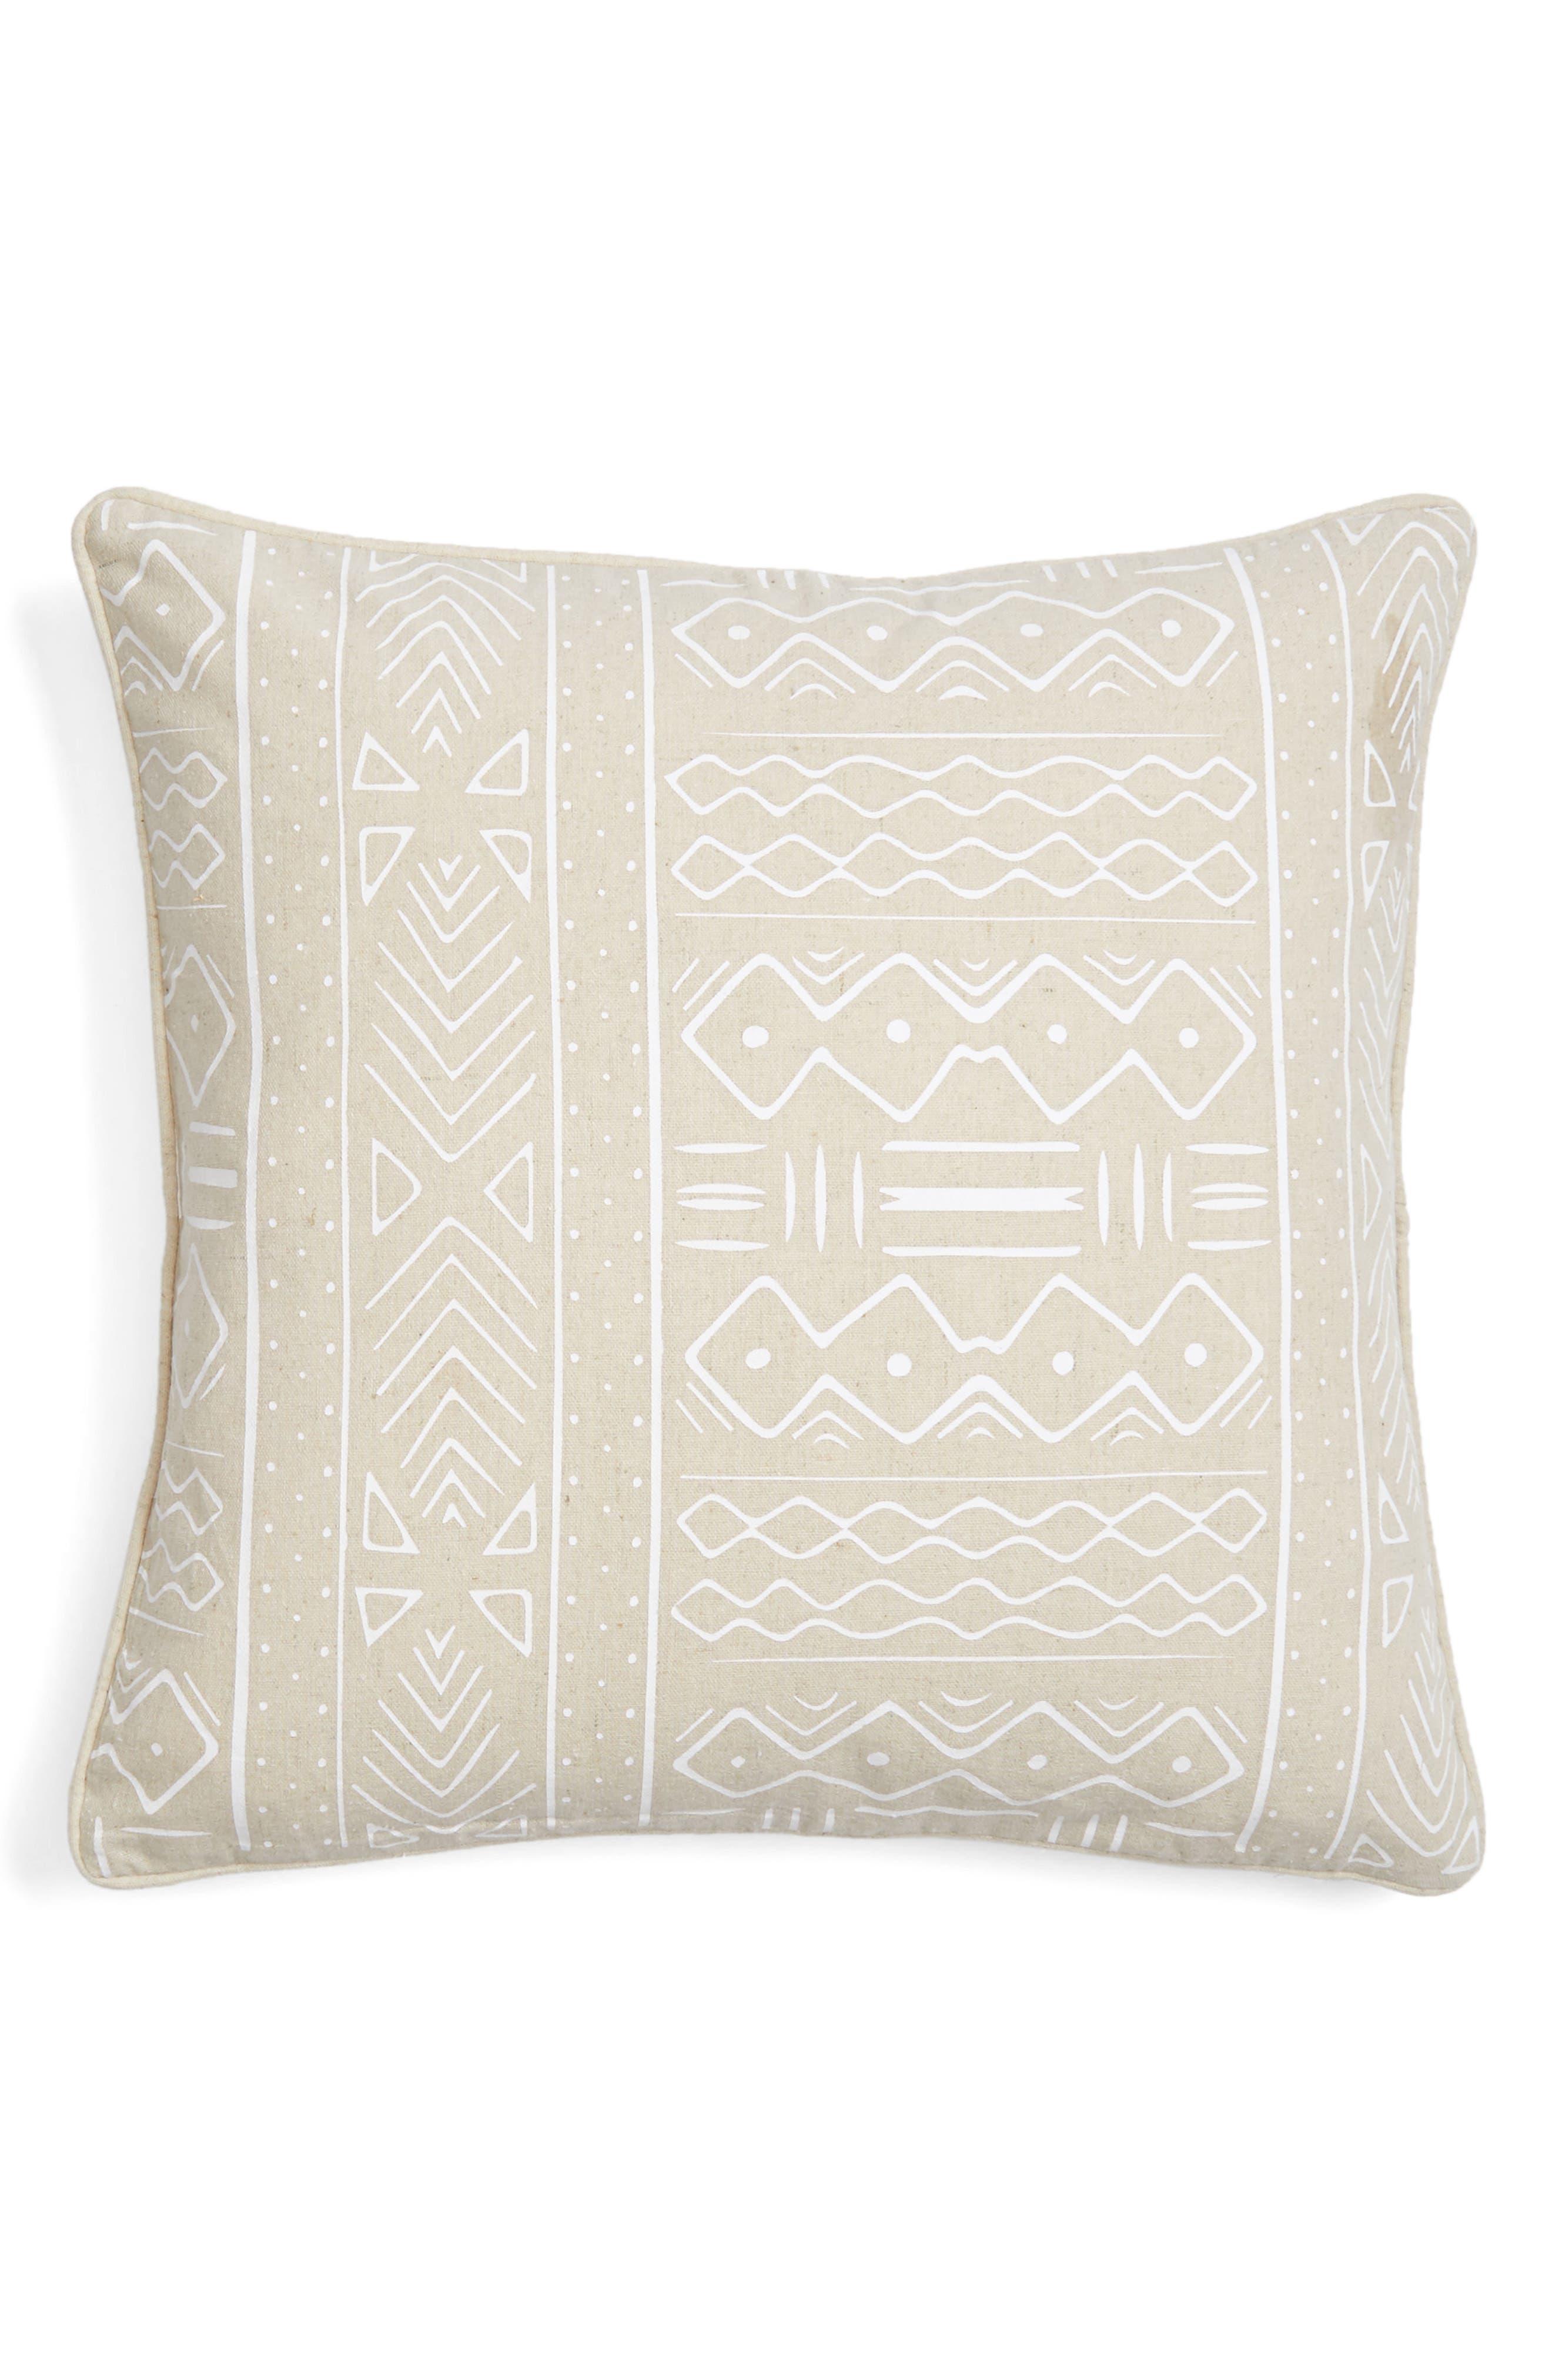 Main Image - Levtex Pinch Mudcloth Pillow